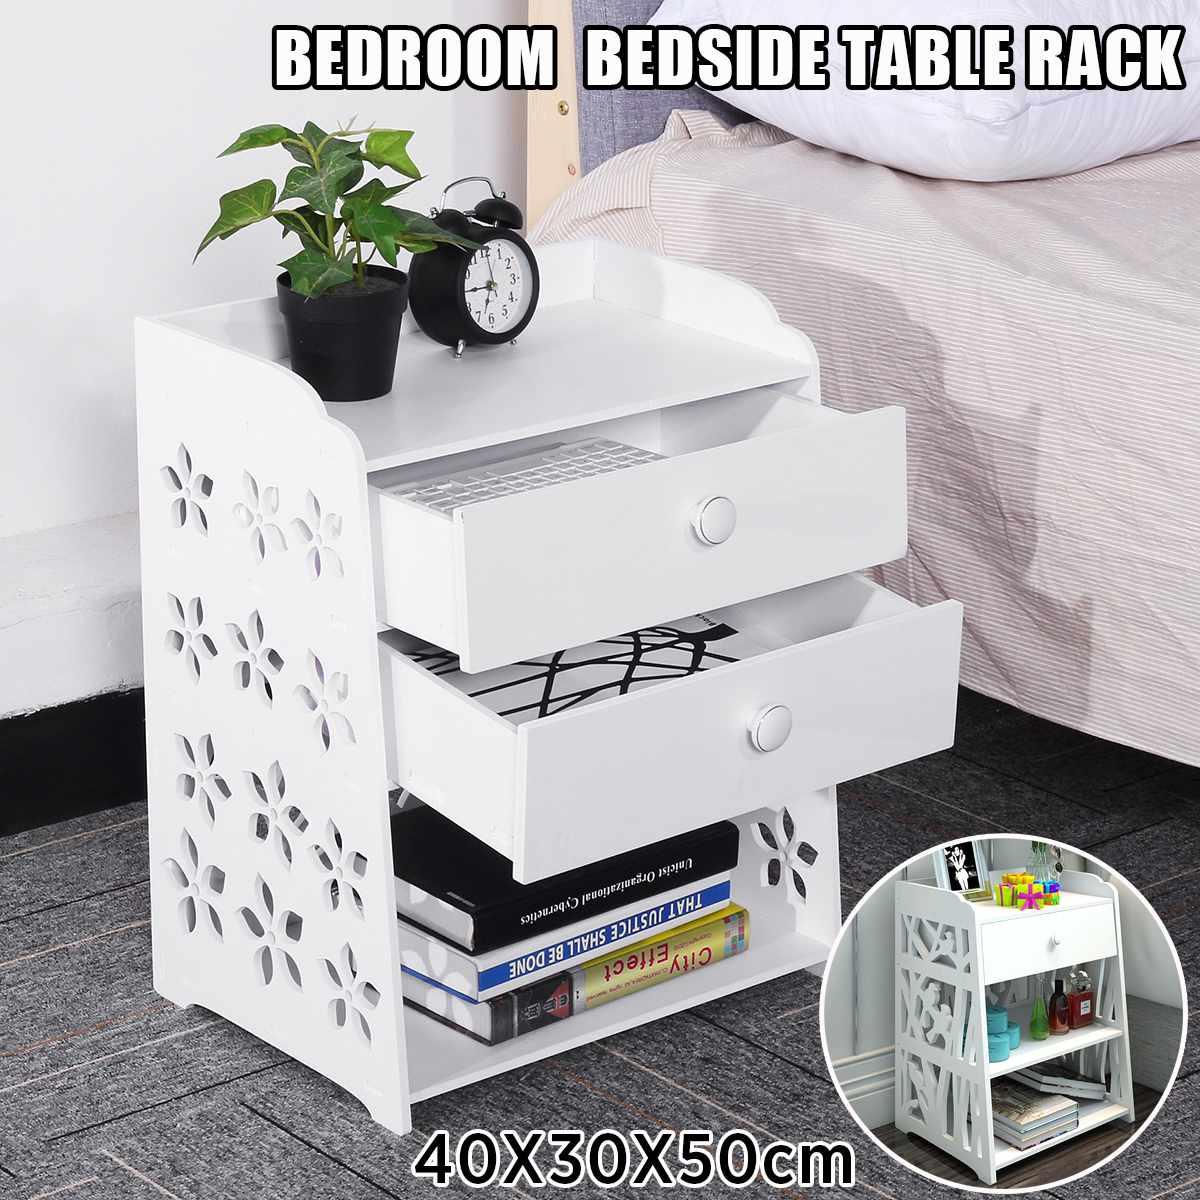 Bedroom Bedside Nightstands Two Drawers Storage Table Rack Night Table Cabinet Locker Organizer Storage Basket Wood-Plastic